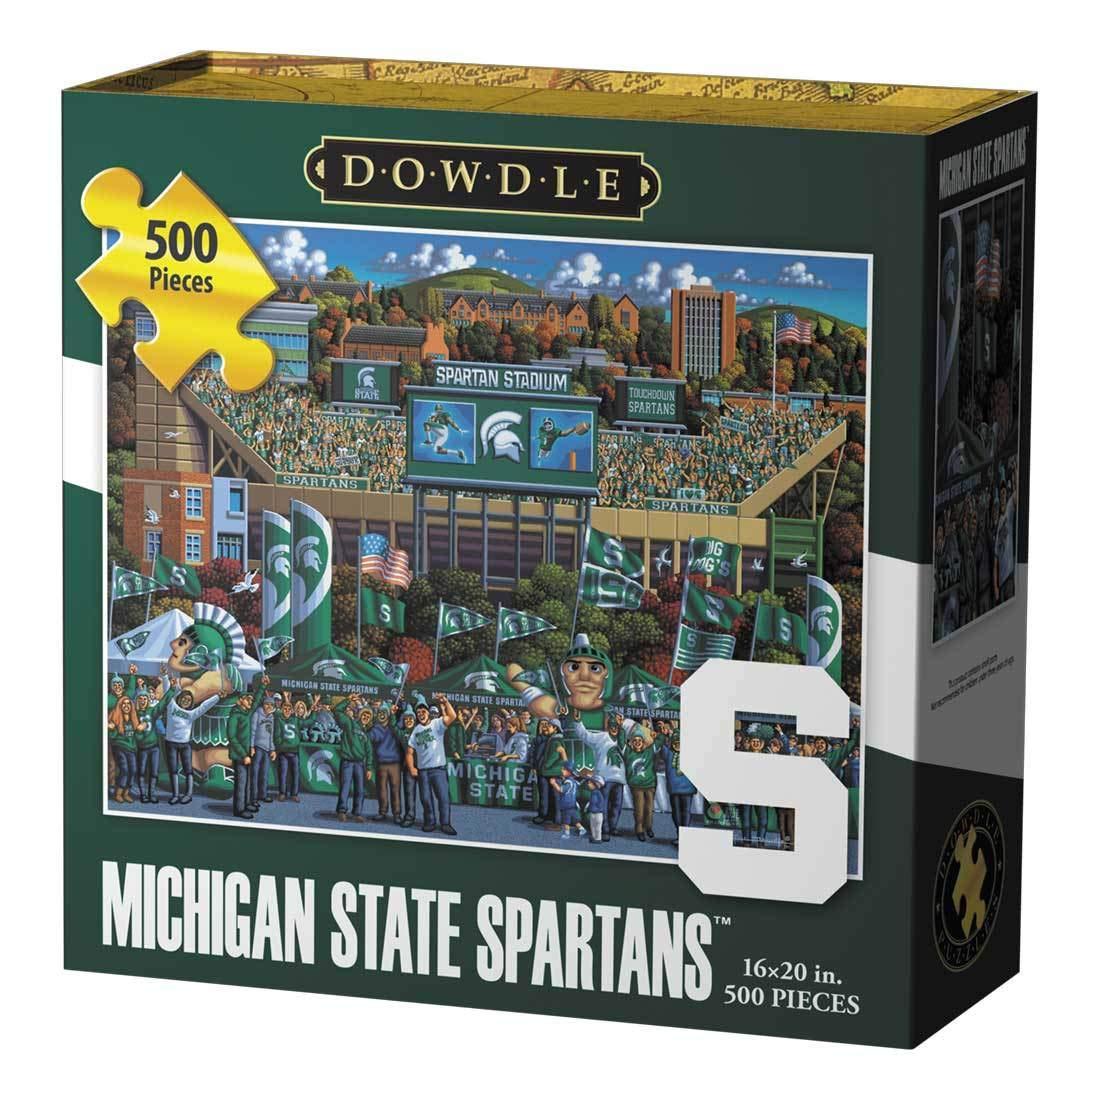 Michigan State Spartans 500 Piece Dowdle Folk Art SG/_B00OAI4T9Q/_US Dowdle Jigsaw Puzzle